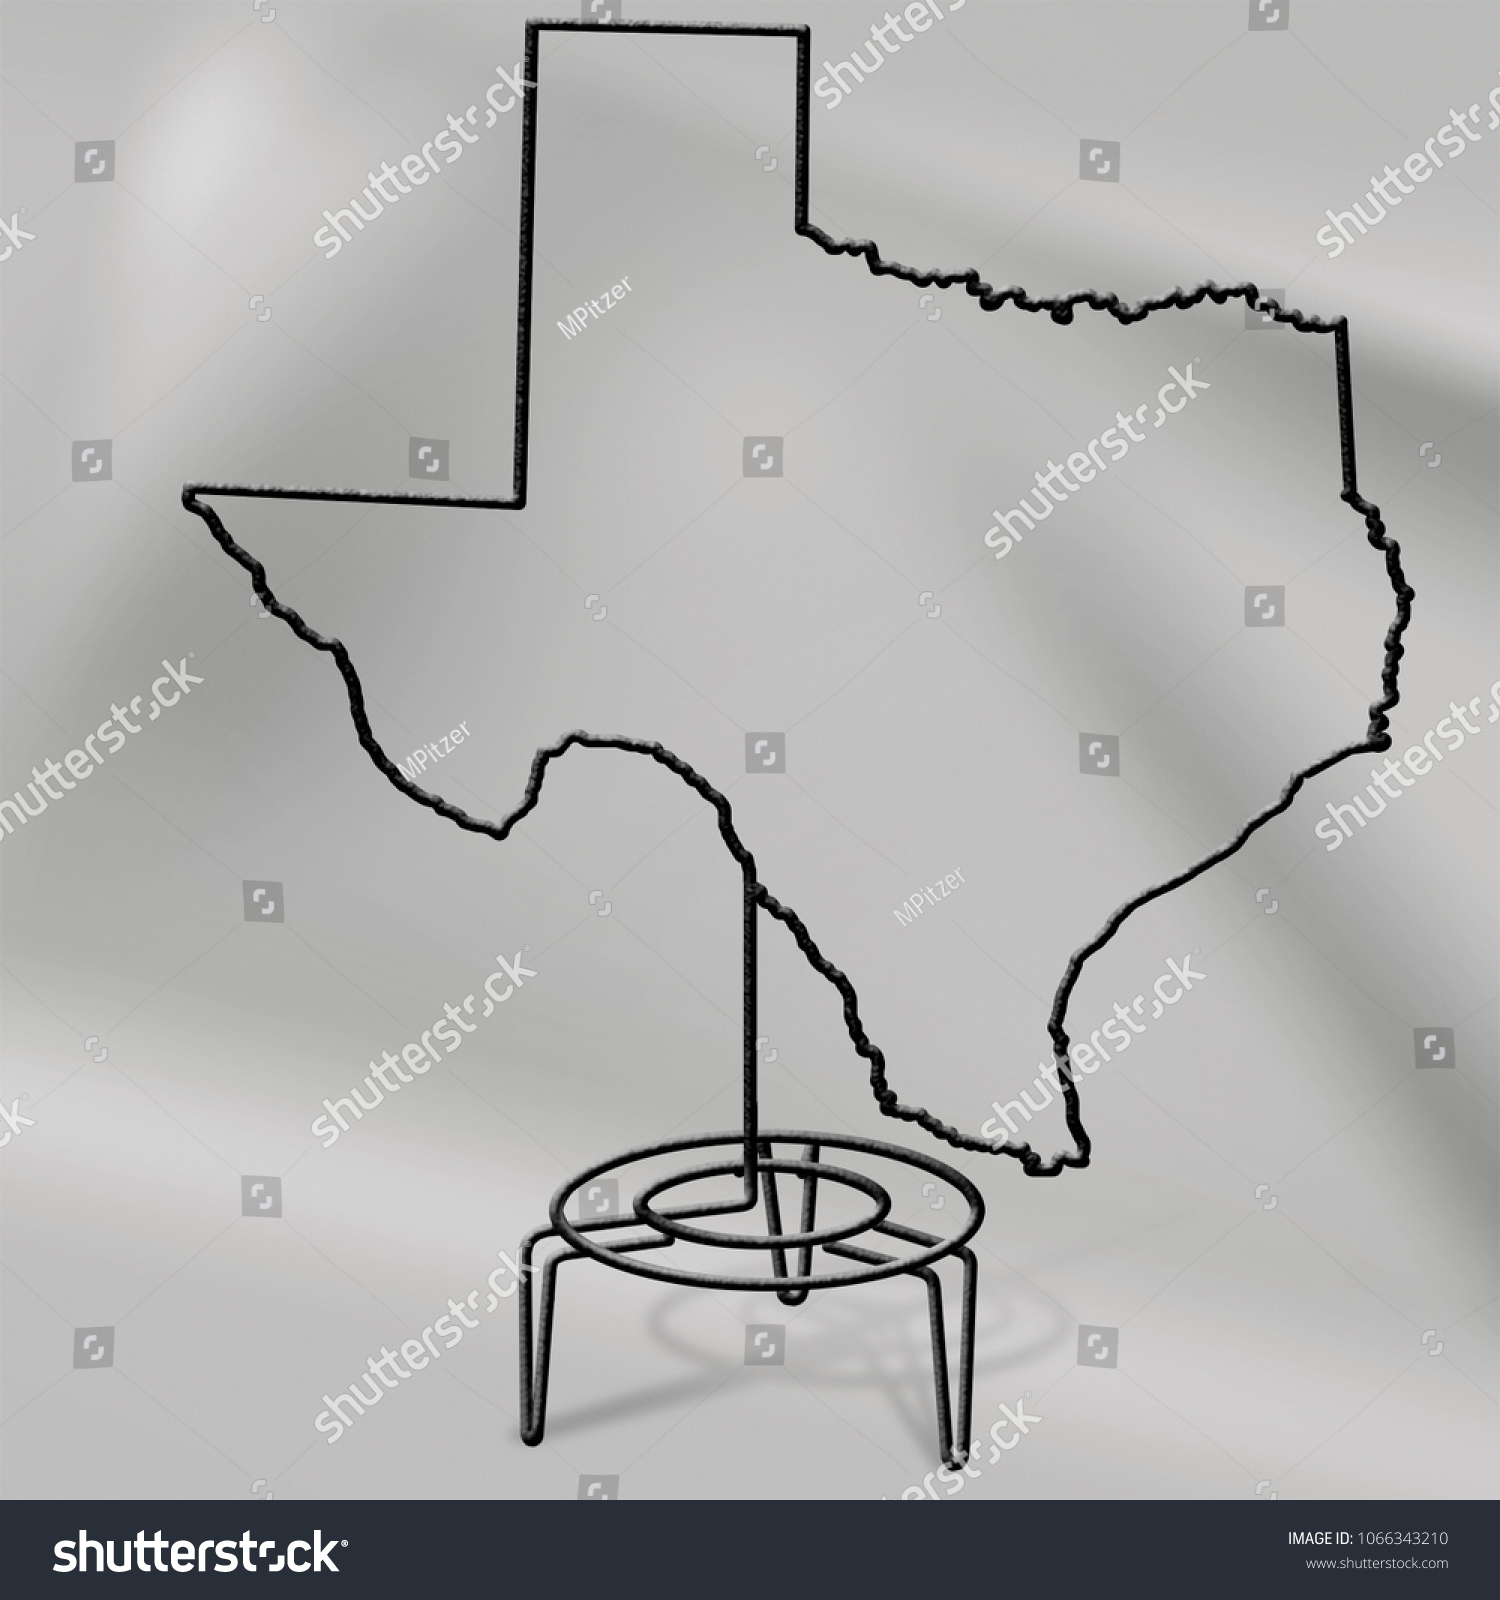 Wire Sculpture Texas Stock Illustration 1066343210 - Shutterstock